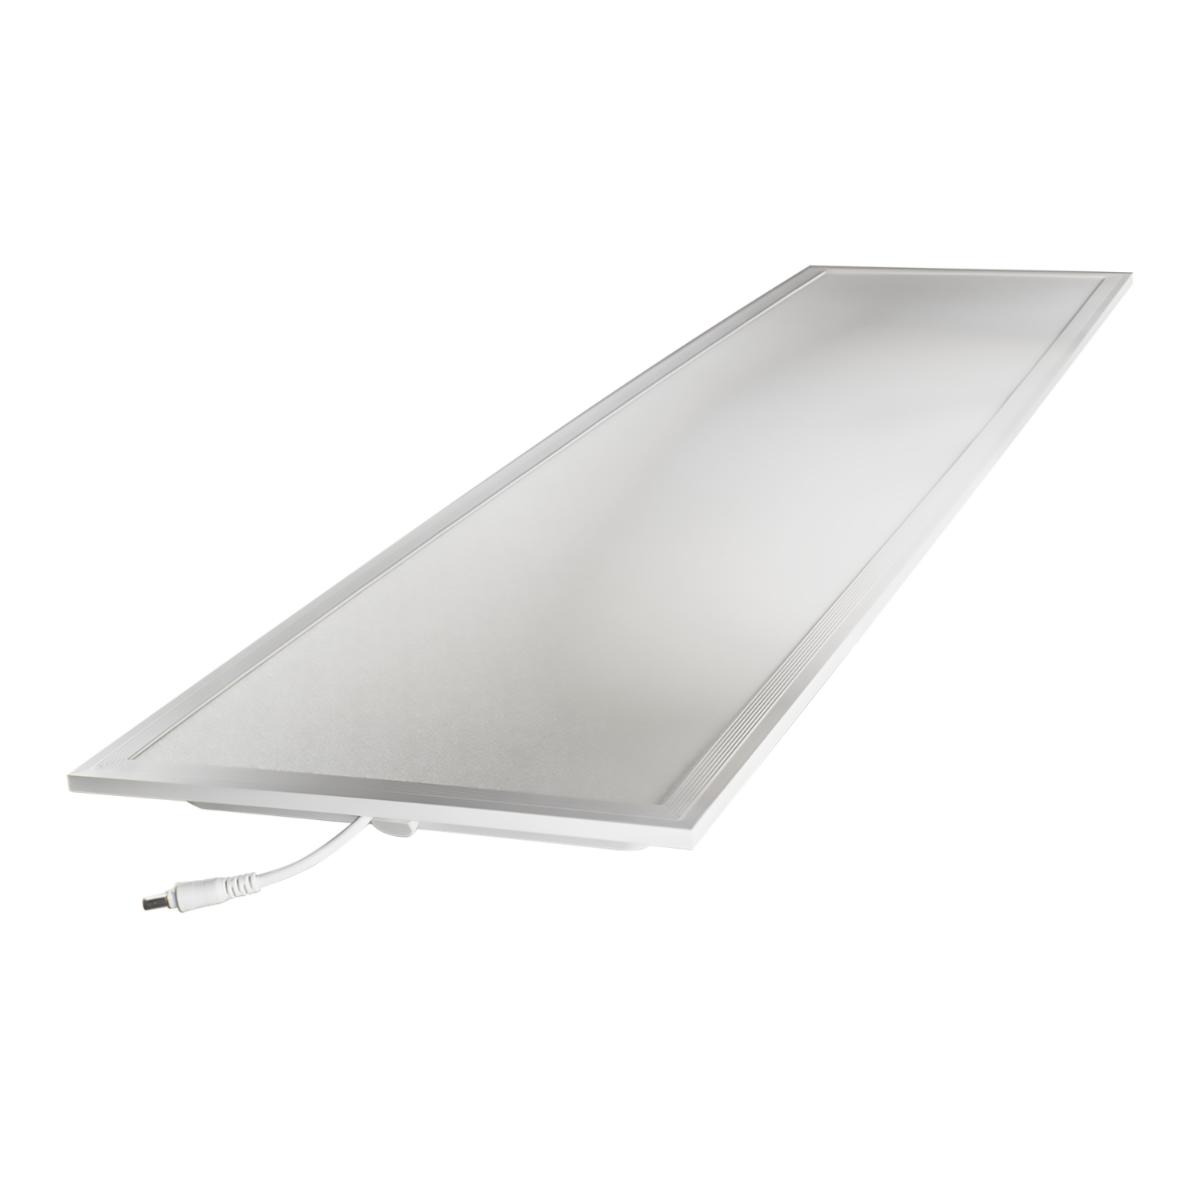 Noxion LED Panel Delta Pro V2.0 Xitanium DALI 30W 30x120cm 3000K 3960lm UGR <19   Dali Dimmbar - Warmweiß - Ersatz für 2x36W